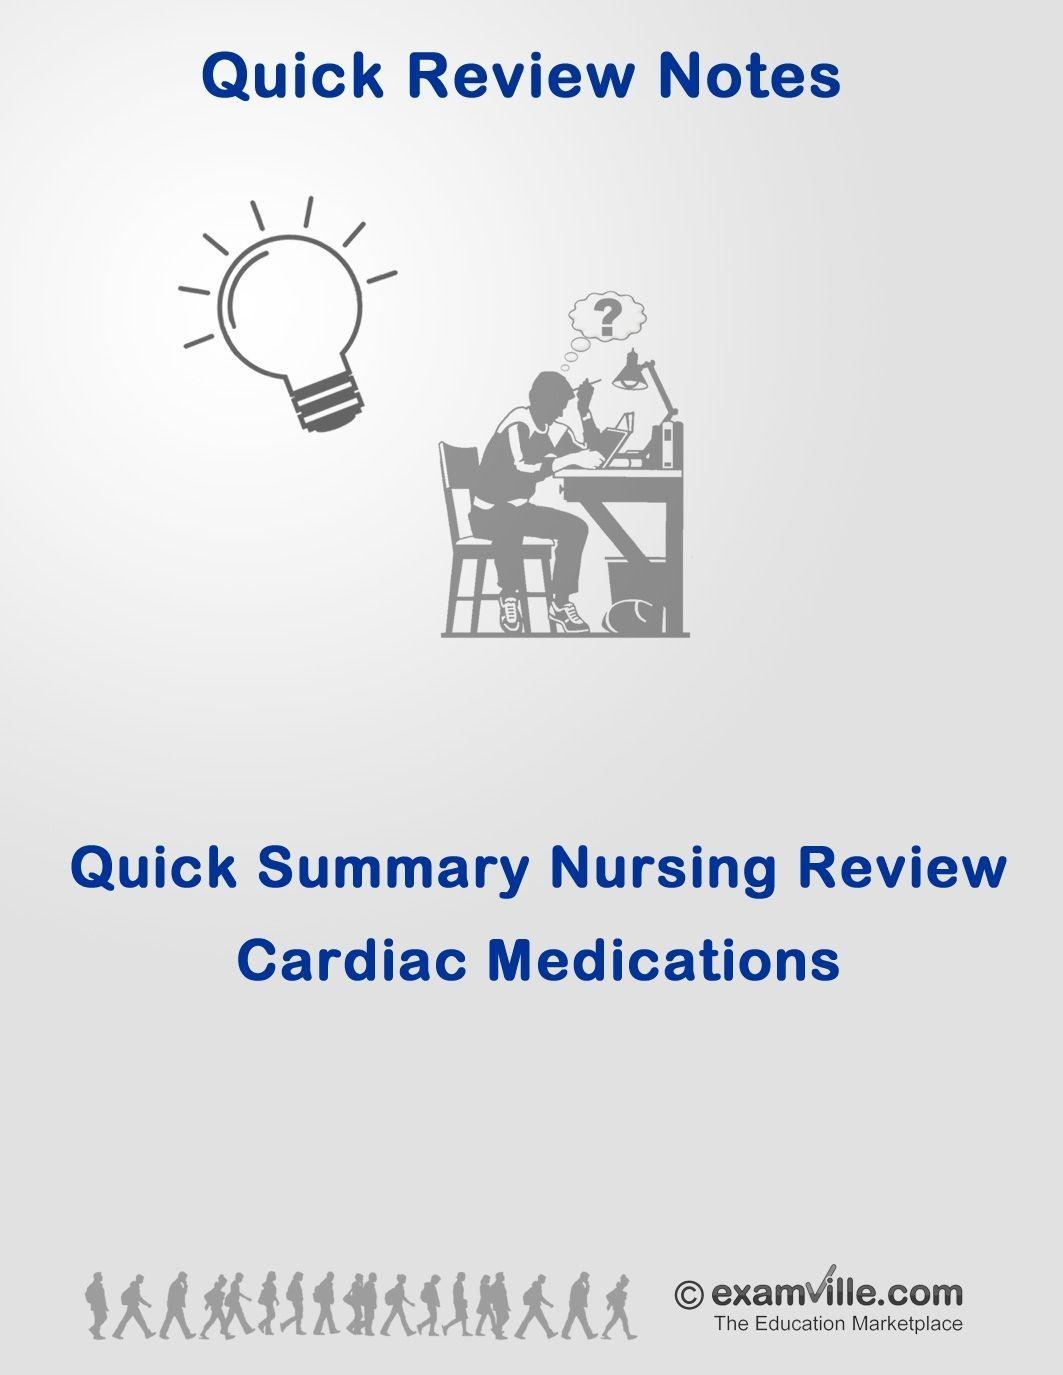 Quick Summary Nursing Review - Cardiac Medications | Nclex